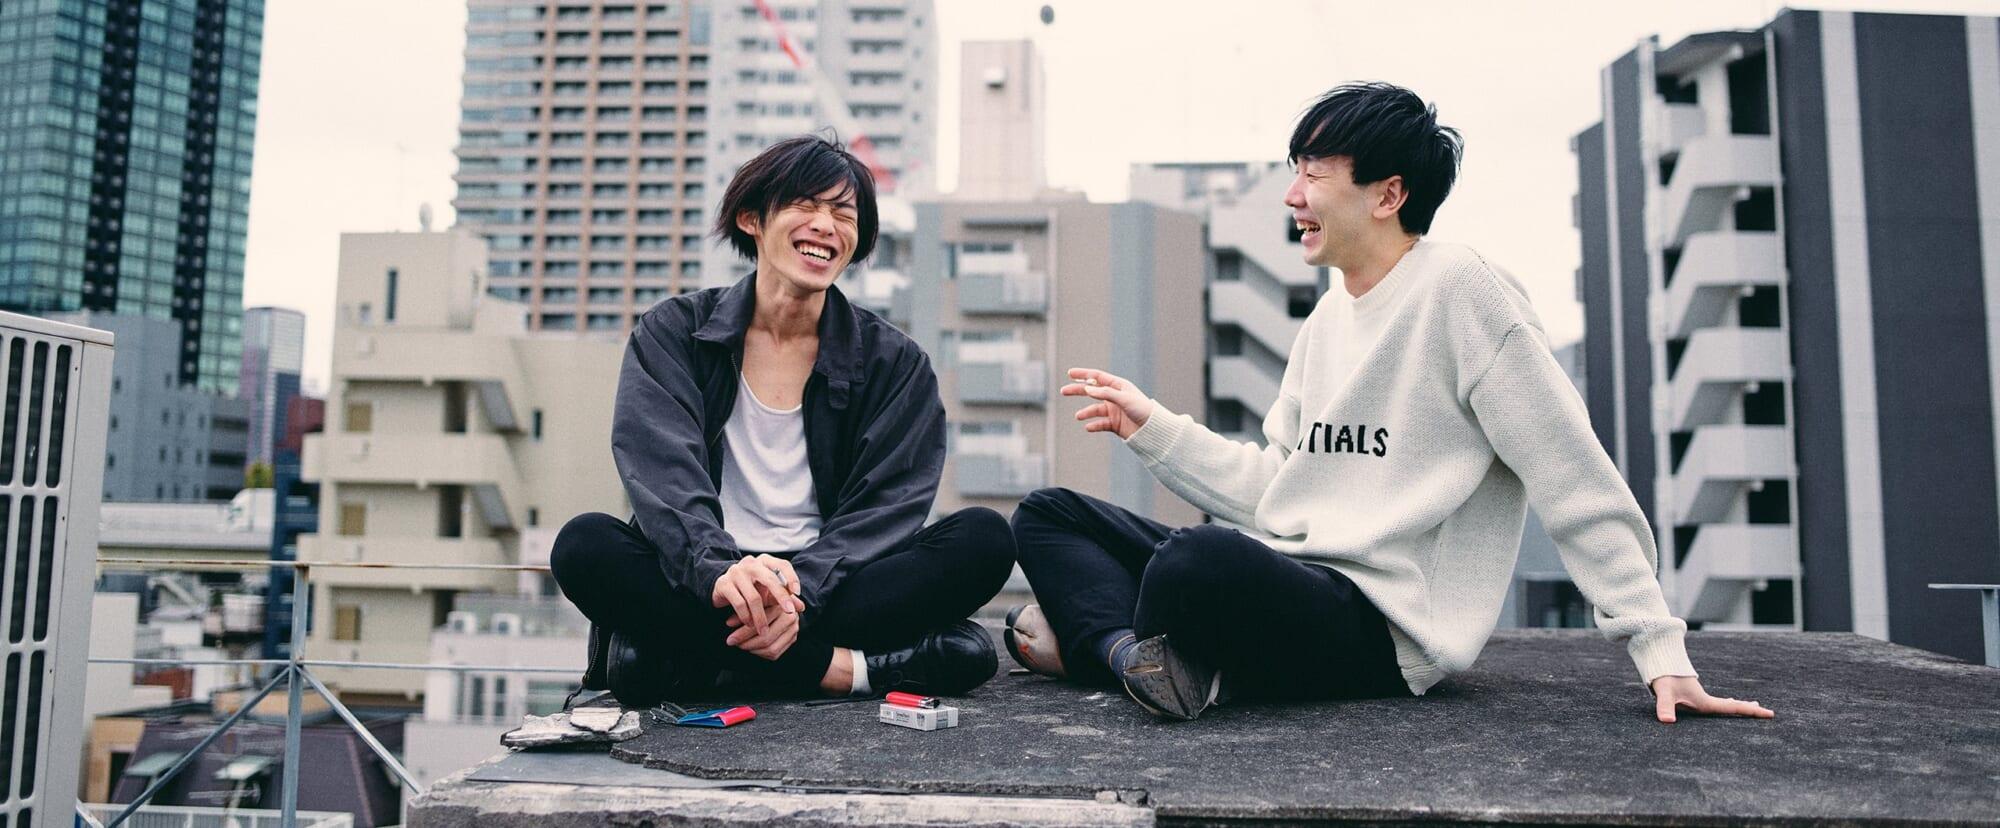 Interview|君島大空×西田修大『縫層』で輝くギタリストとしての側面